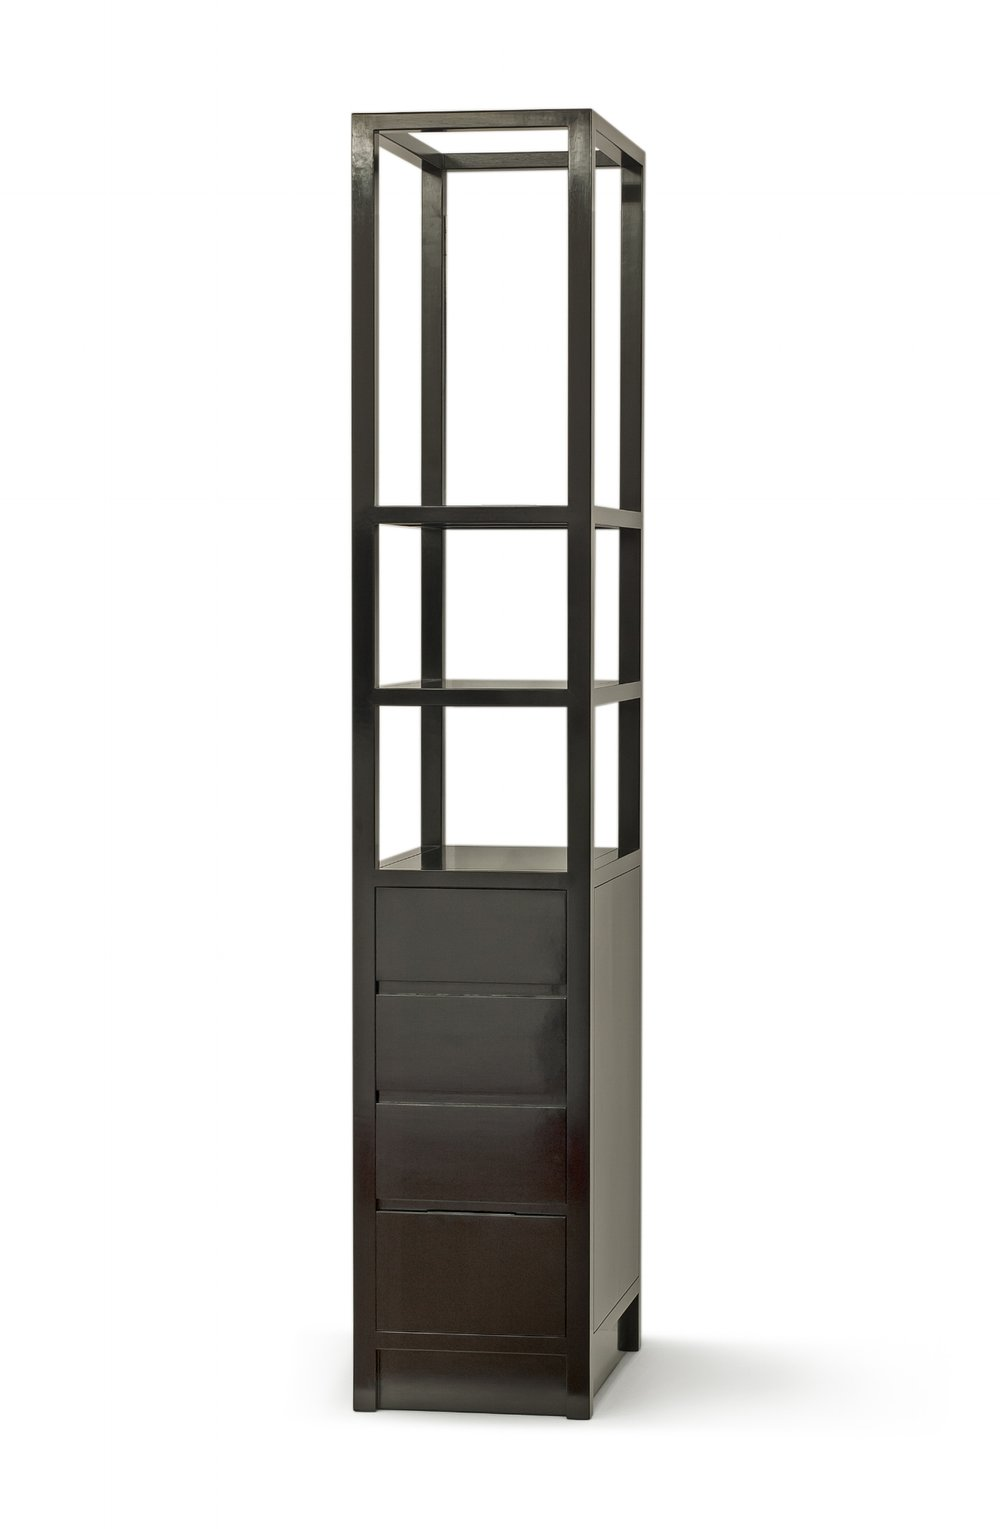 ....Bespoke Modern furniture : Shelf Cabinet..特别定制现代家具: 层板架柜....